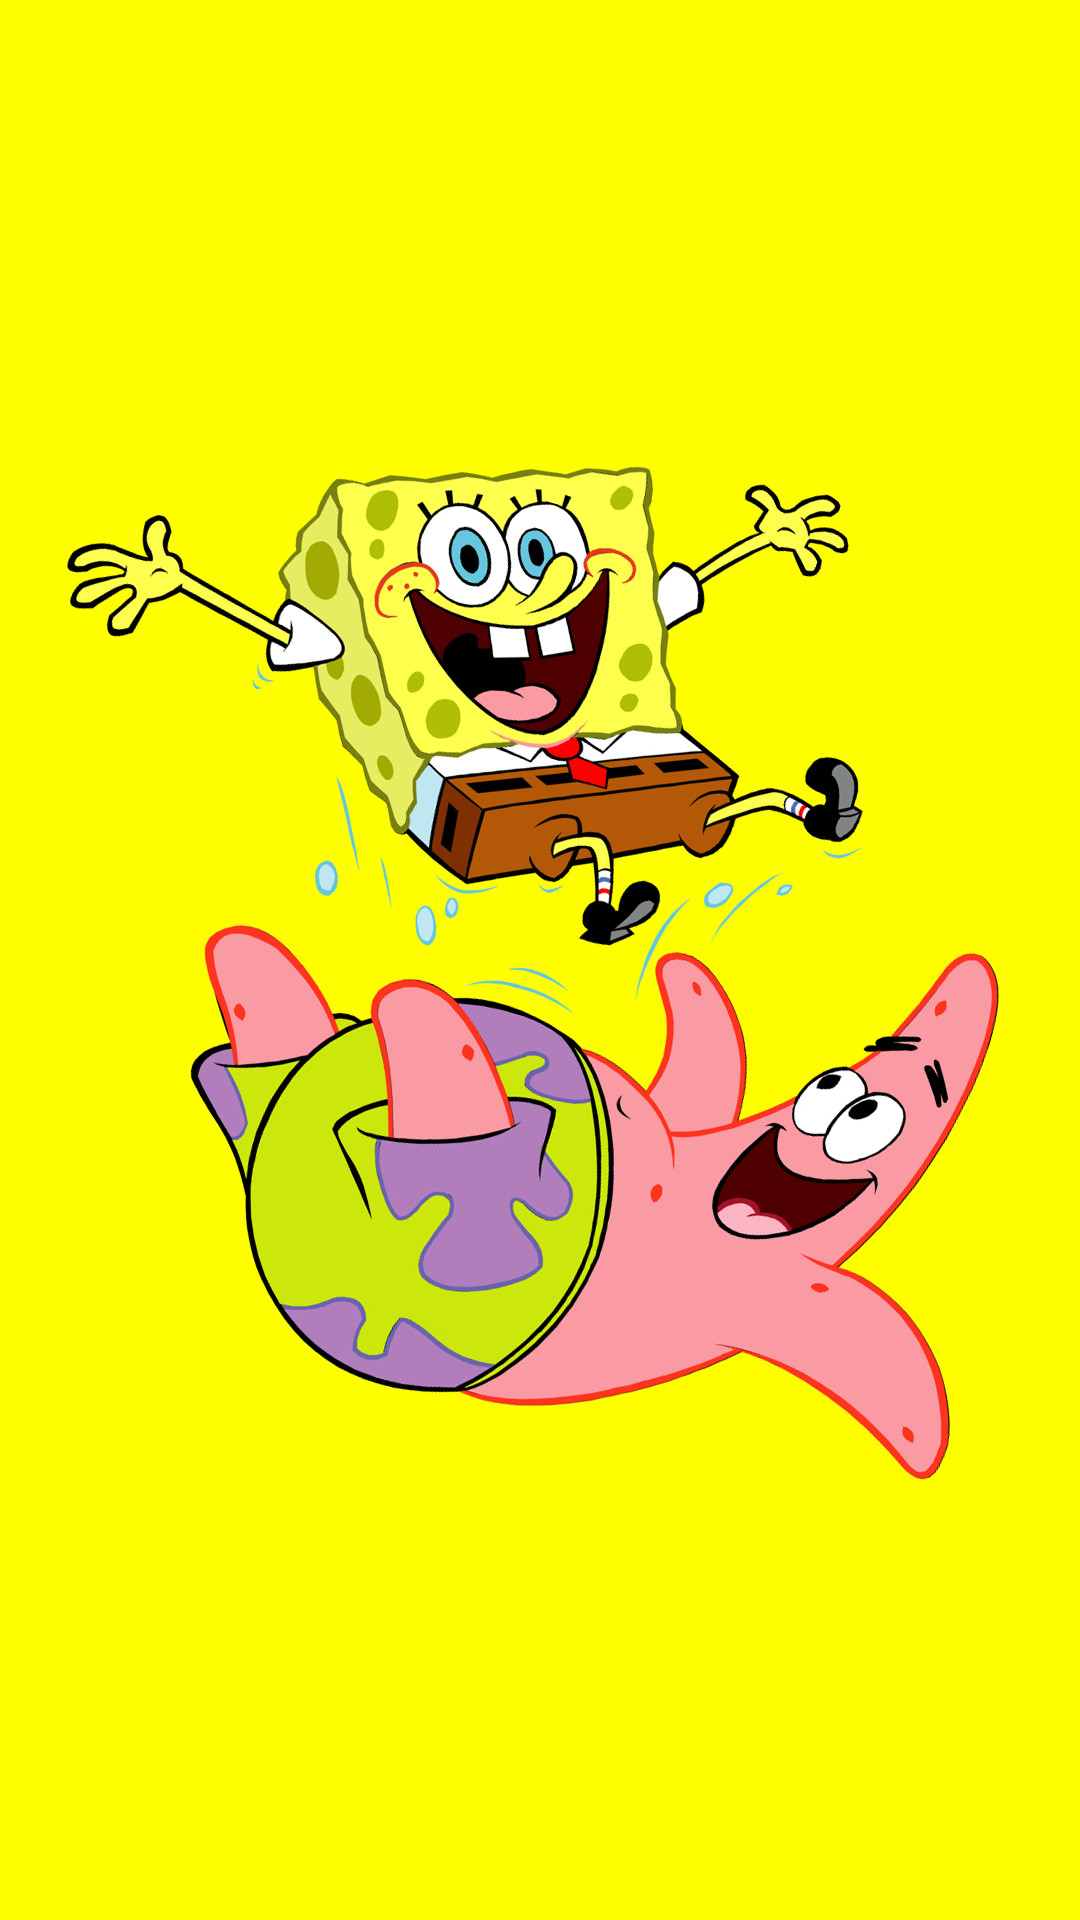 funny spongebob wallpaper 183��